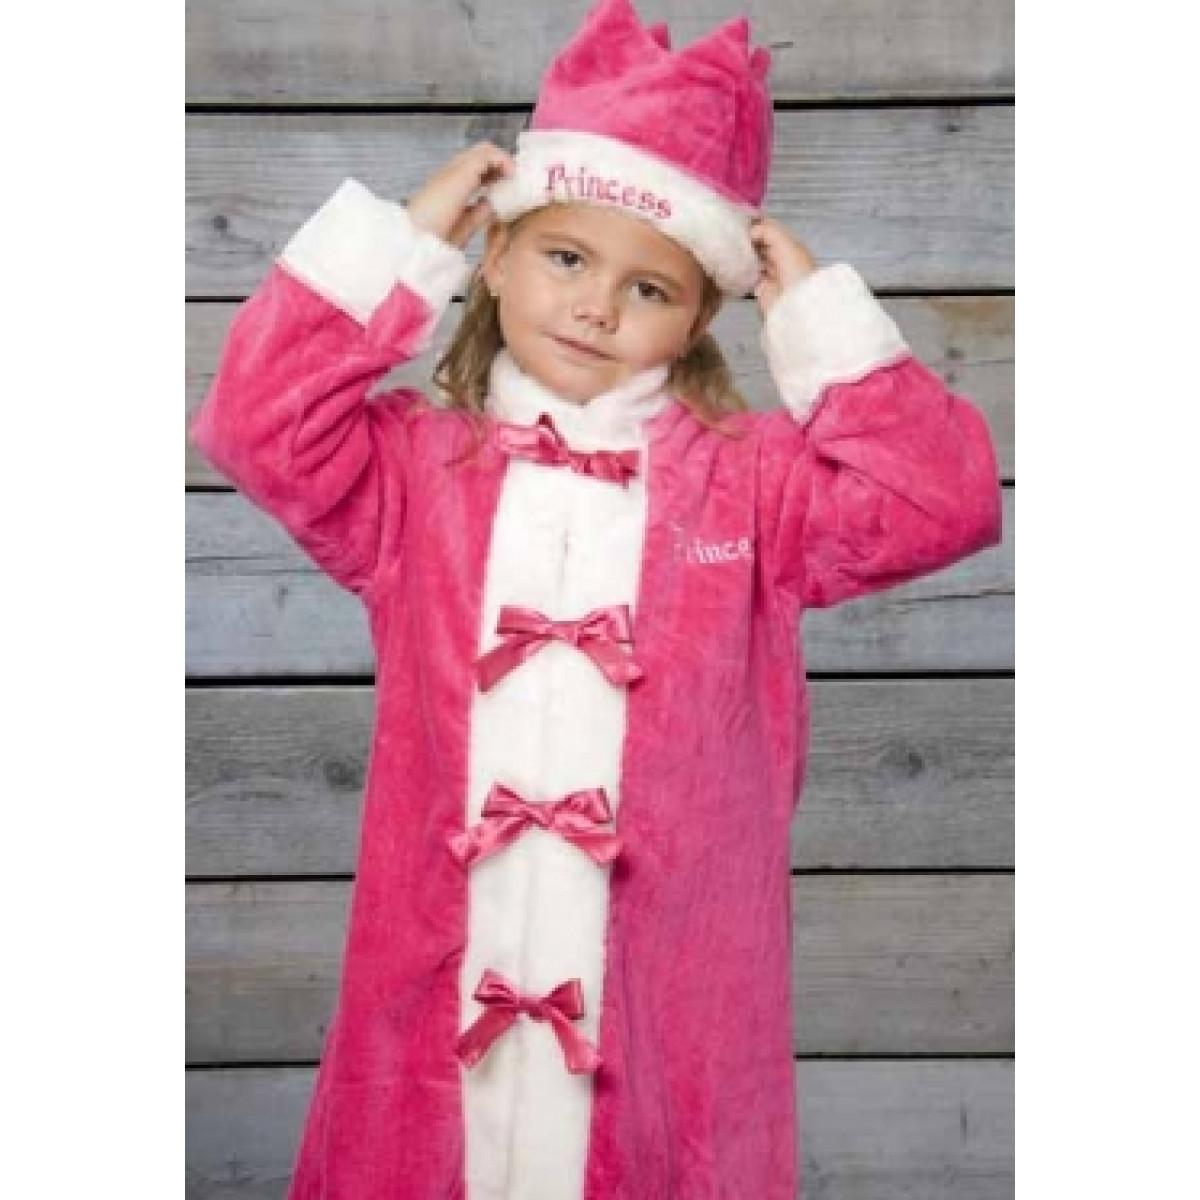 Kinderbadjas voor prinsessen